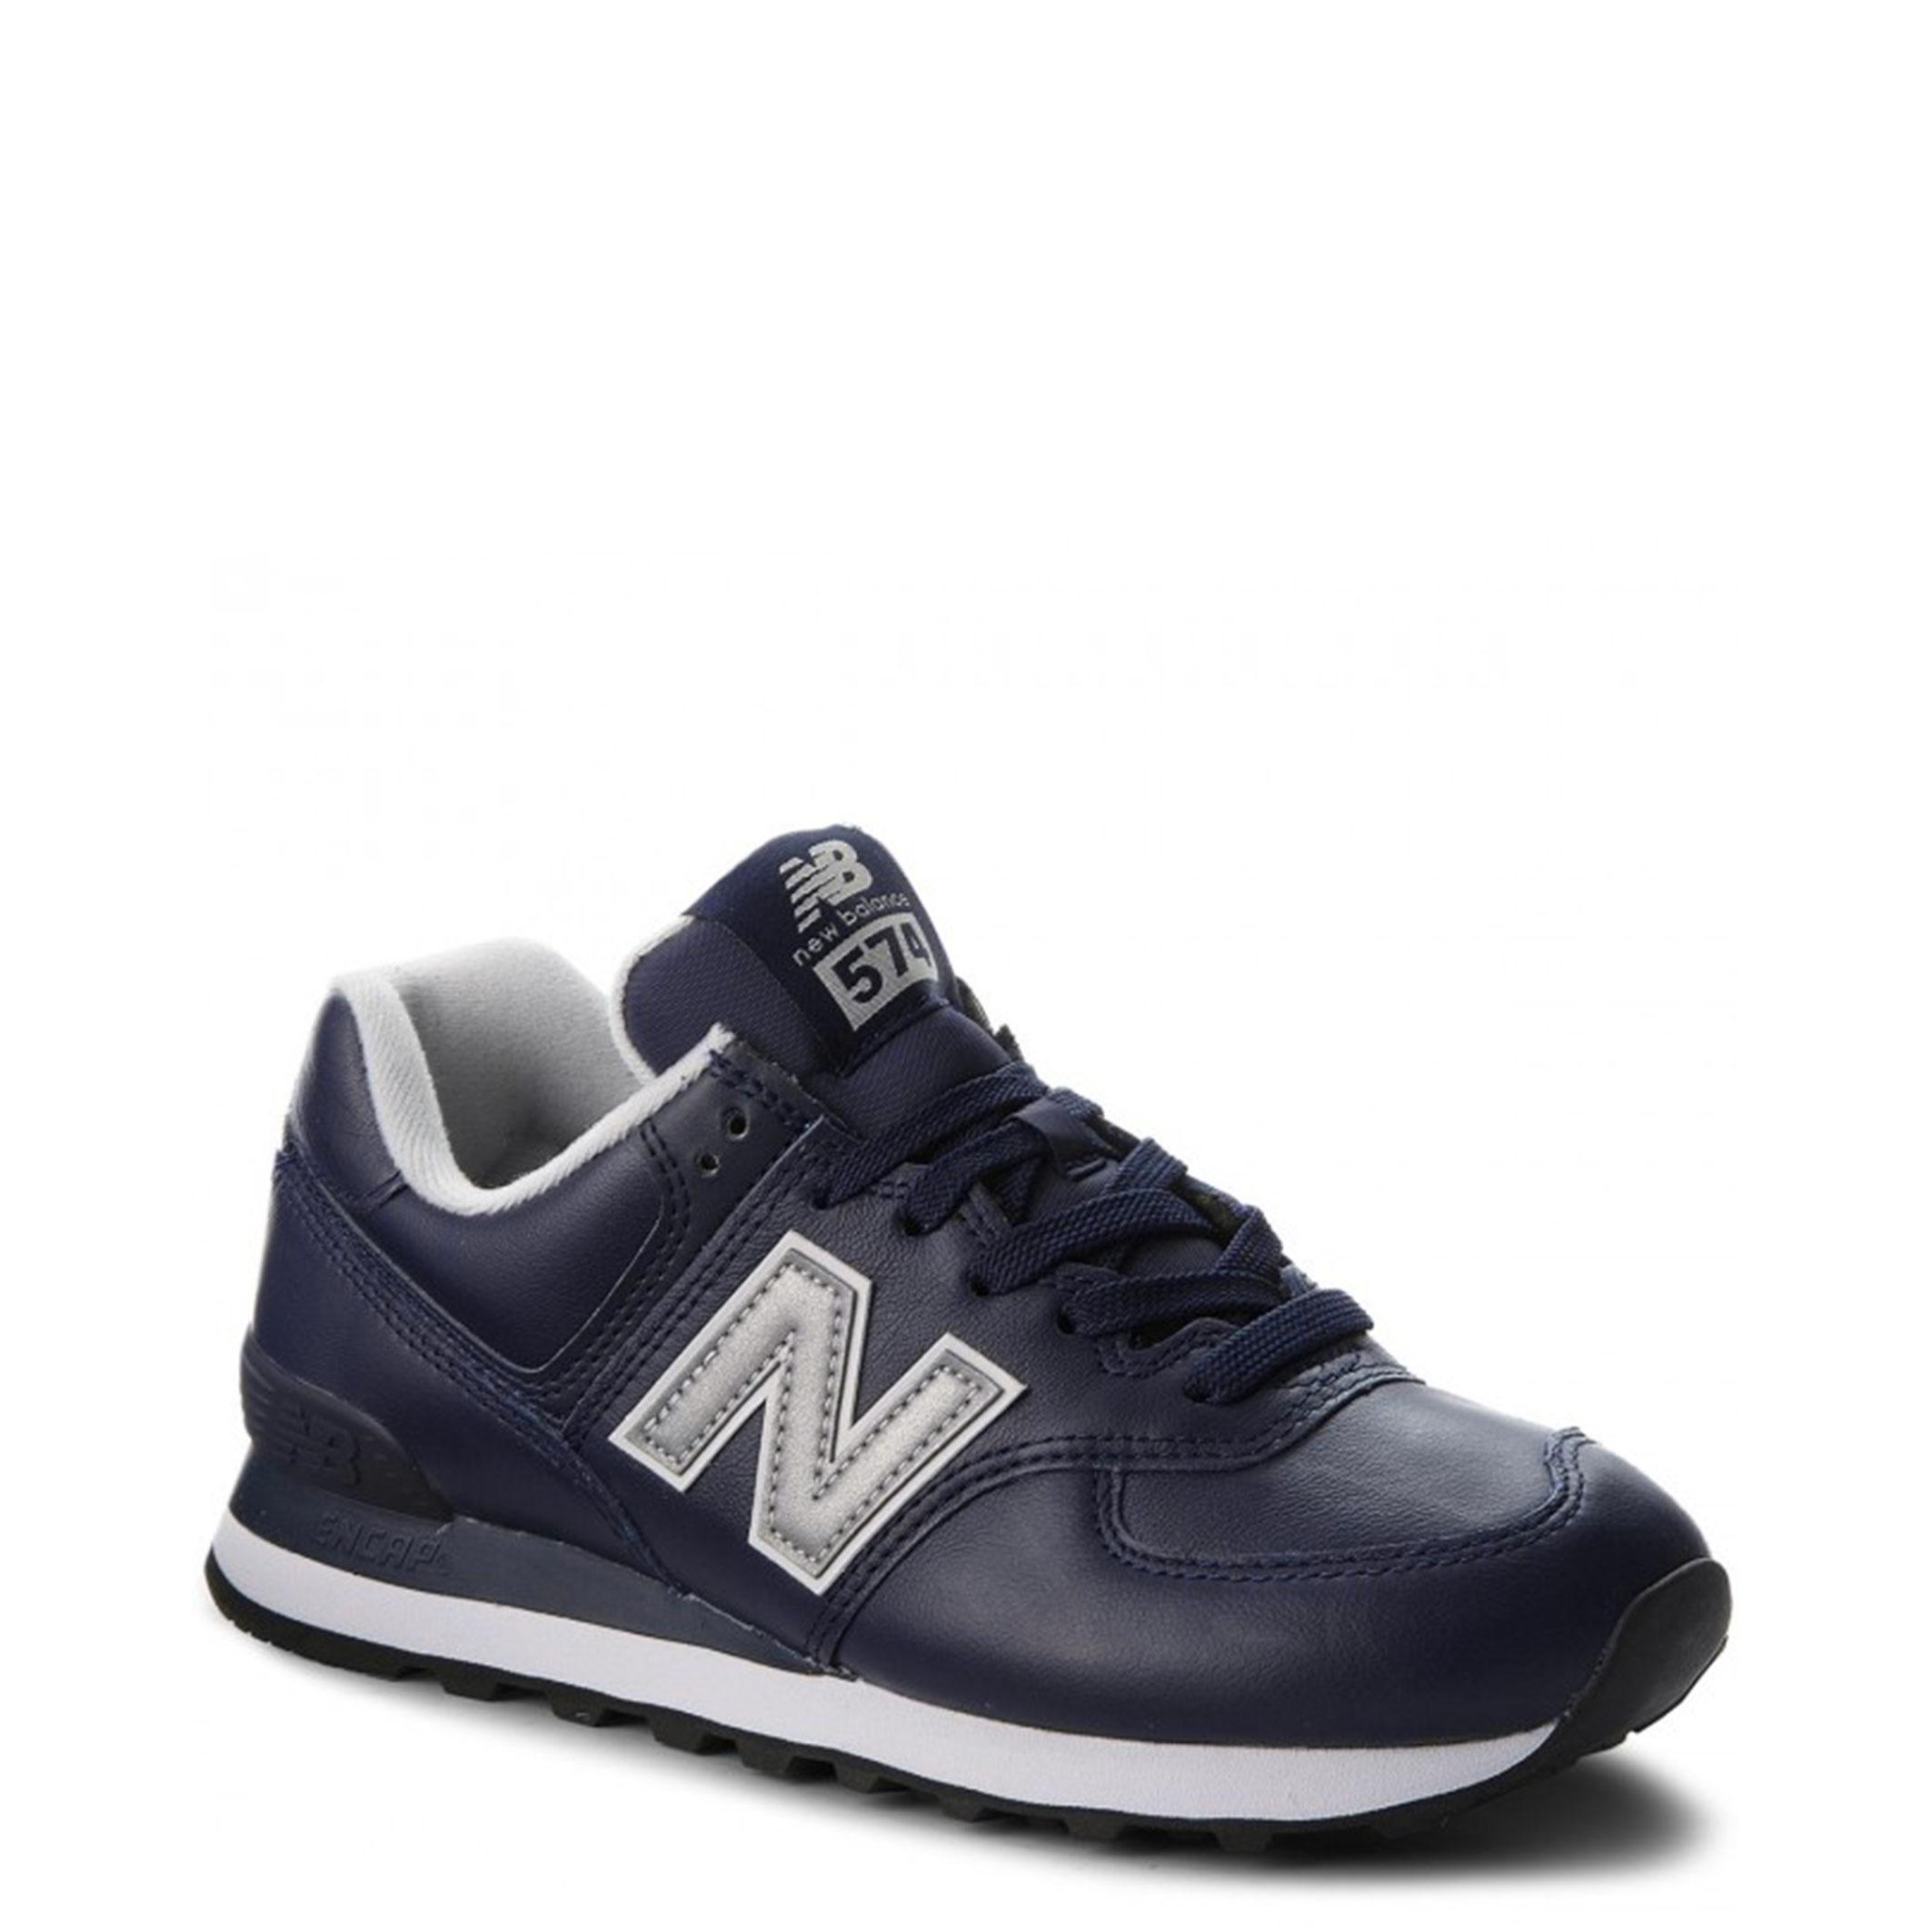 New Balance Schuhe ML574, Blau/Schwarz/Blau/Schwarz/Blau Herren Sneakers Blau/Schwarz/Blau/Schwarz/Blau ML574, turnsch fc0c7d